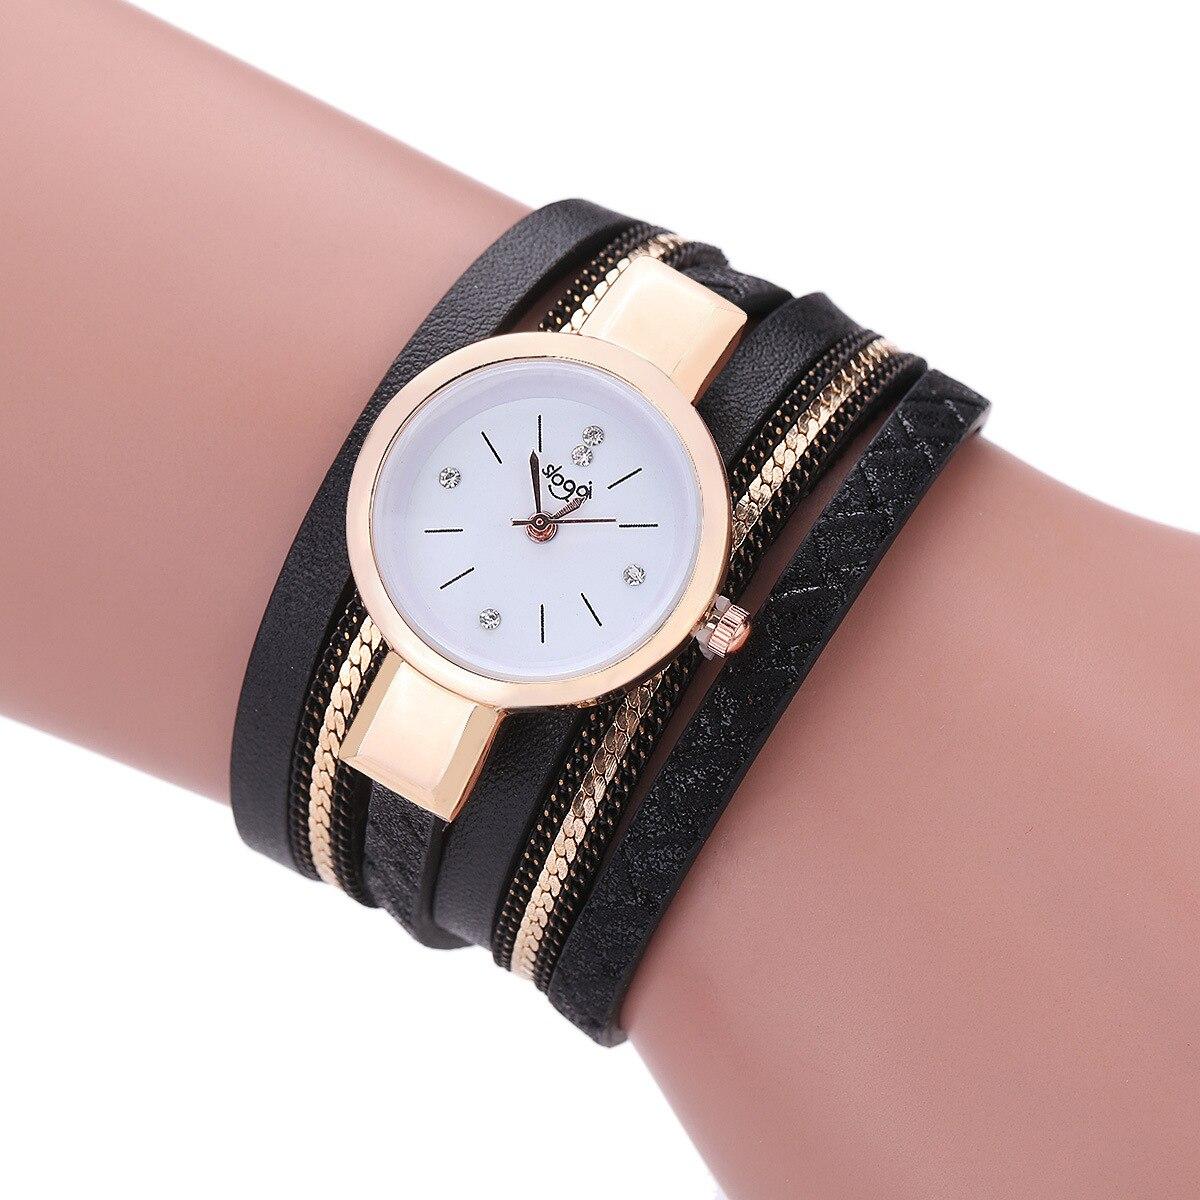 SLOGGI Brand Luxury Watches Women Fashion Gold Bracelet